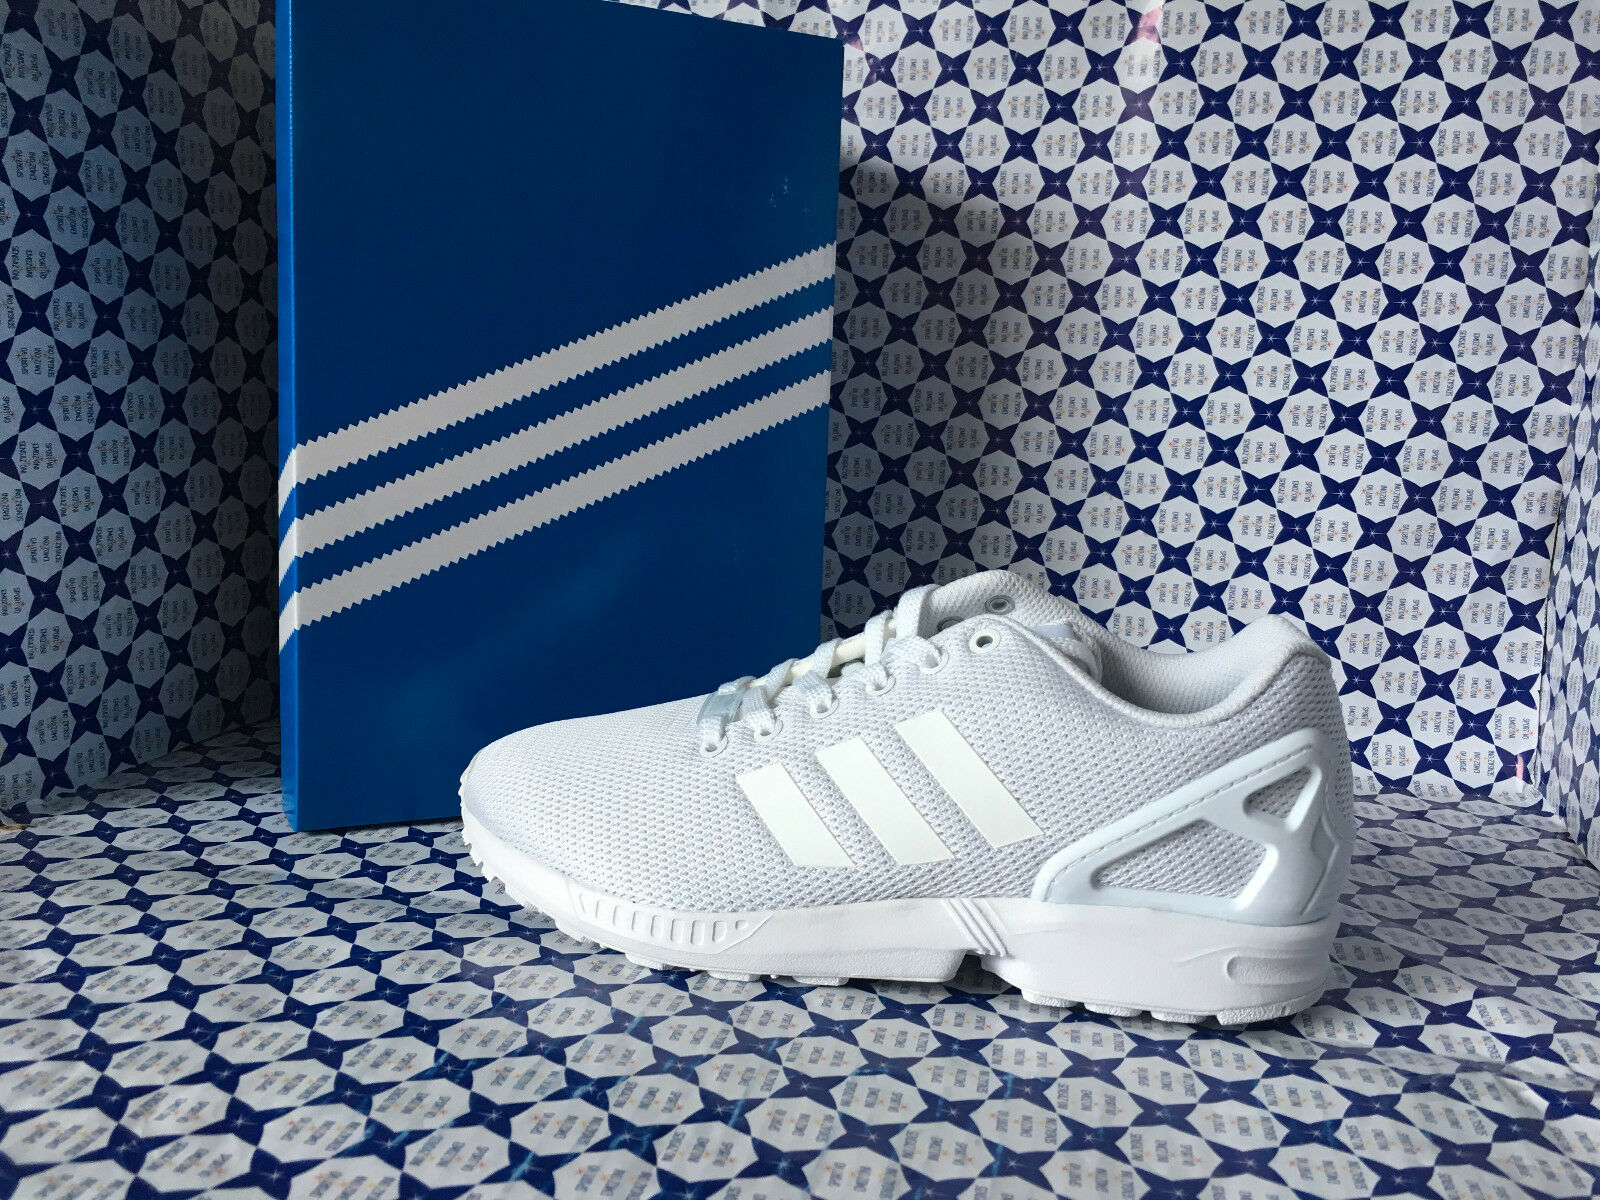 Zapatos hombre  Adidas Zx Flux hombre Zapatos  Bianco  S32277 d3b15f